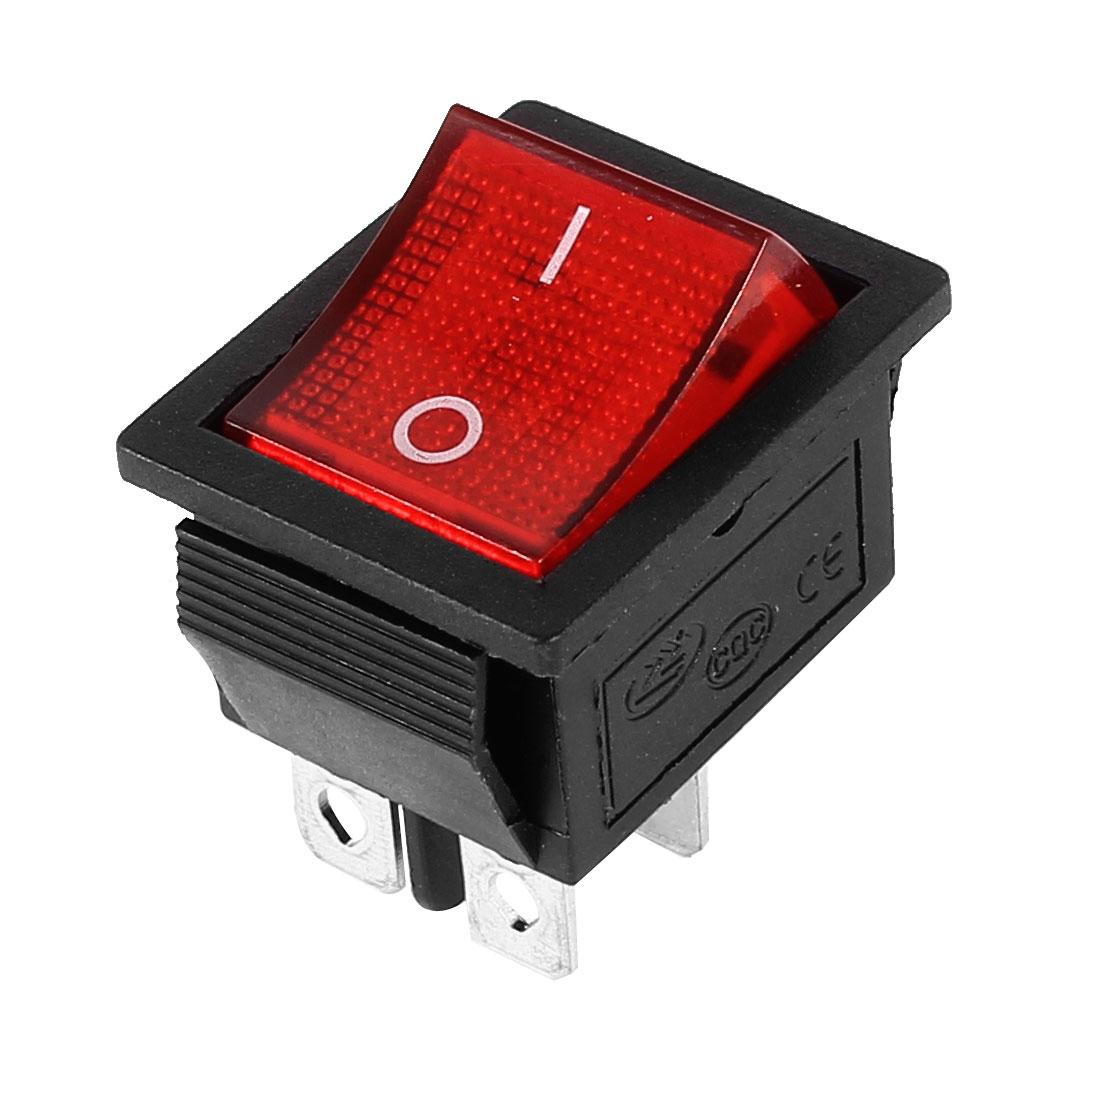 KCD4 DPST 4 Pin On/Off Boat Rocker Switch Red Light AC 15A/250V 20A/125V